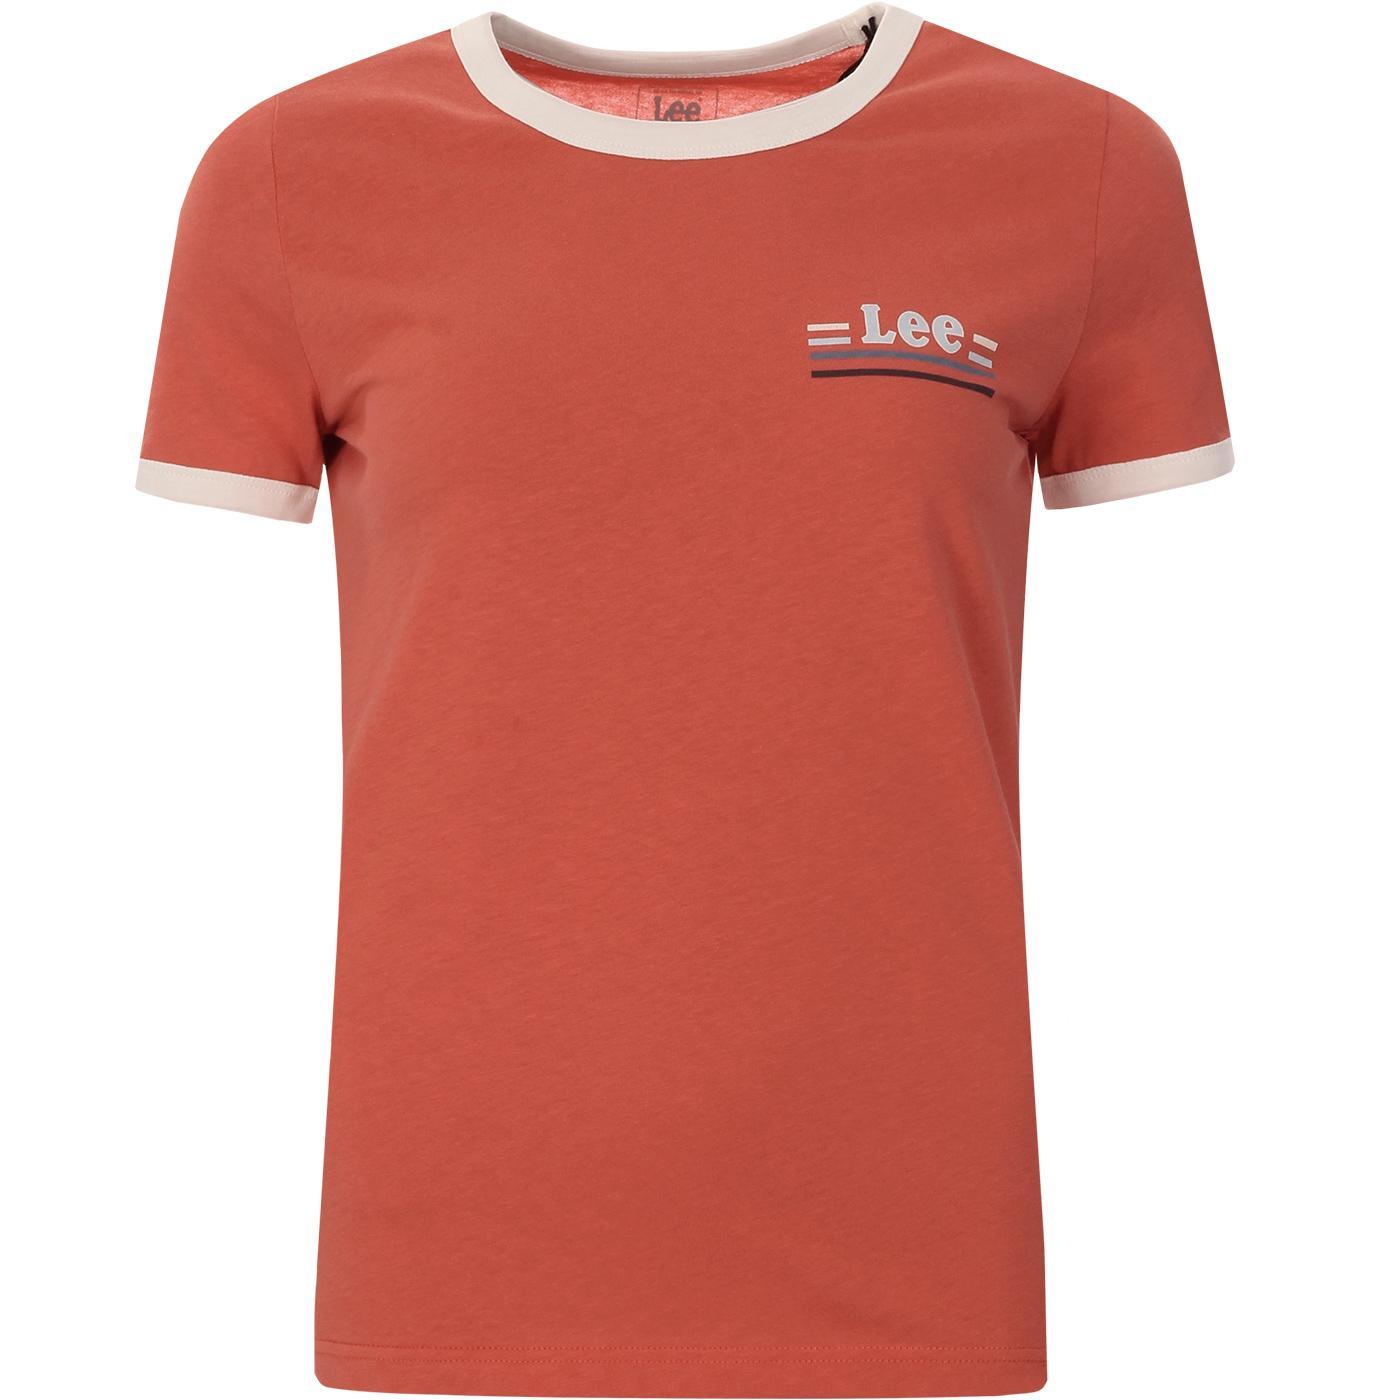 LEE Women's Retro 70s Ringer T-shirt (Paprika)